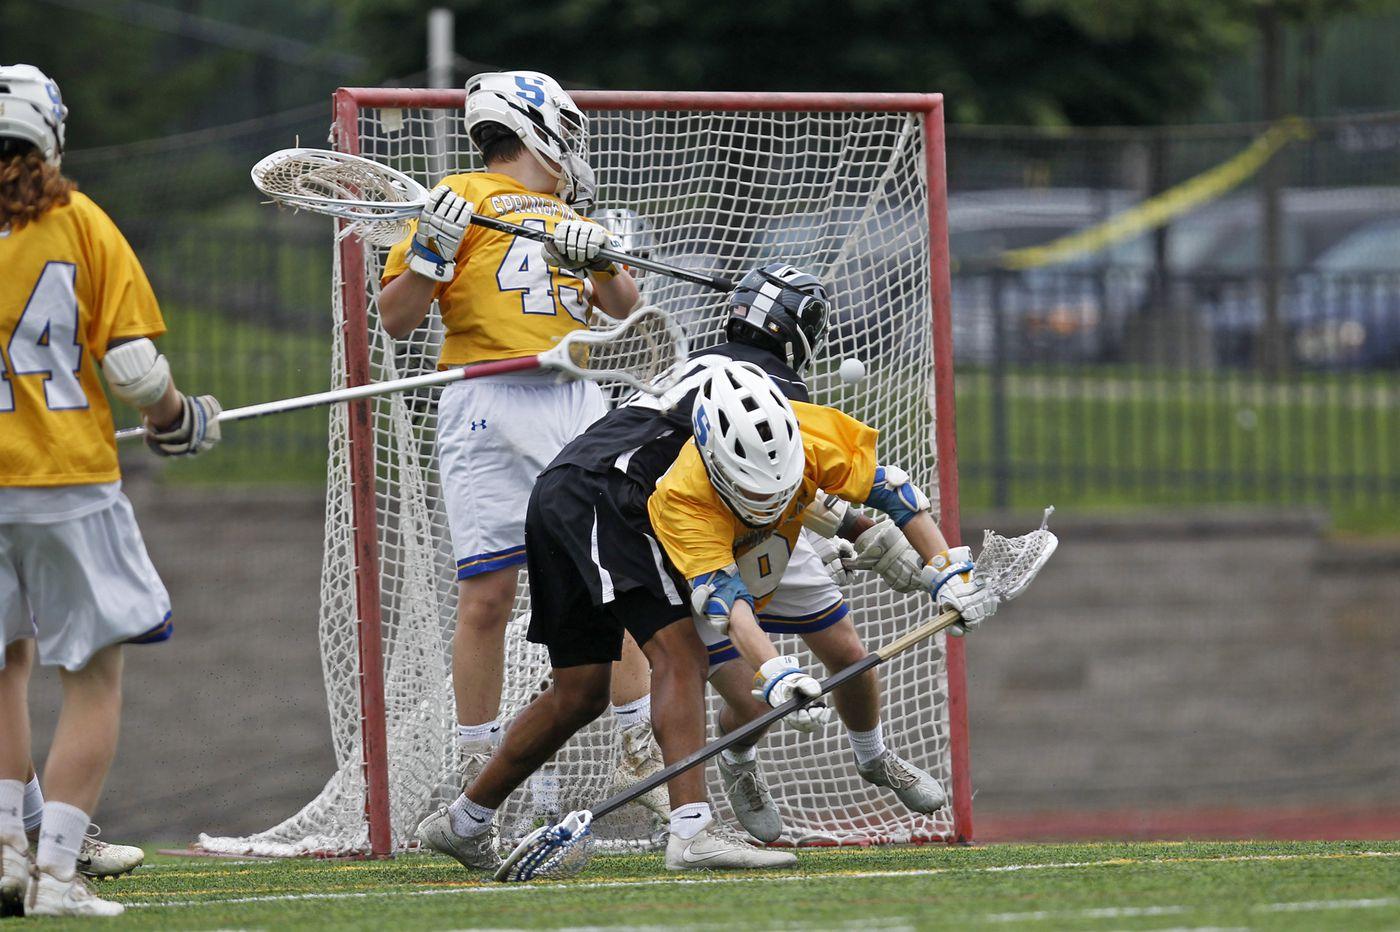 Strath Haven tops Springfield Delco in boys' lacrosse PIAA state quarterfinals